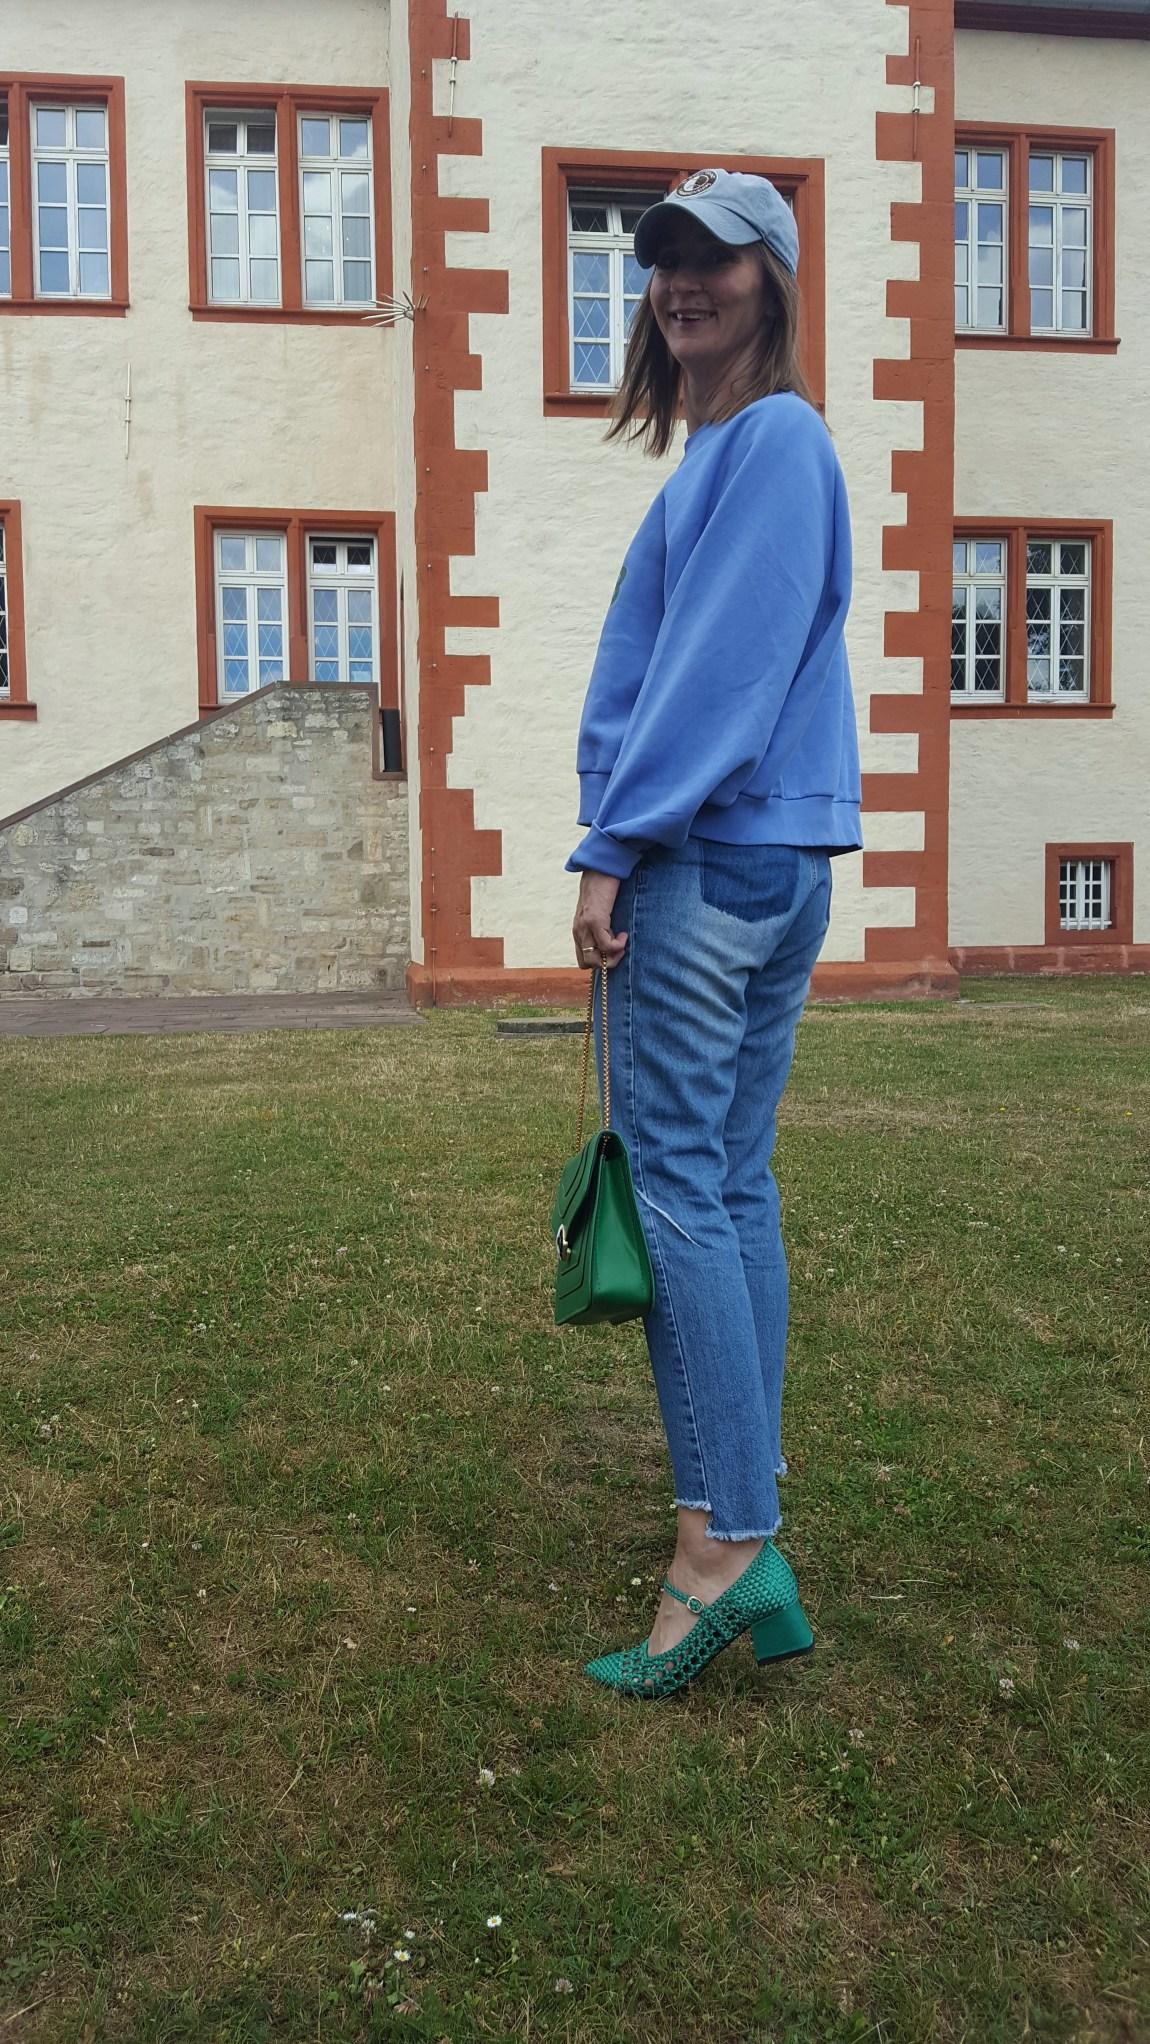 Rattan-Schuhe_jeans-destroyed_weekday_sweatshirt-blau_casual-look_schloss-salder_mode-blog_frau_ü40_oceanblue-style_bulgari_tasche-gruen (12)